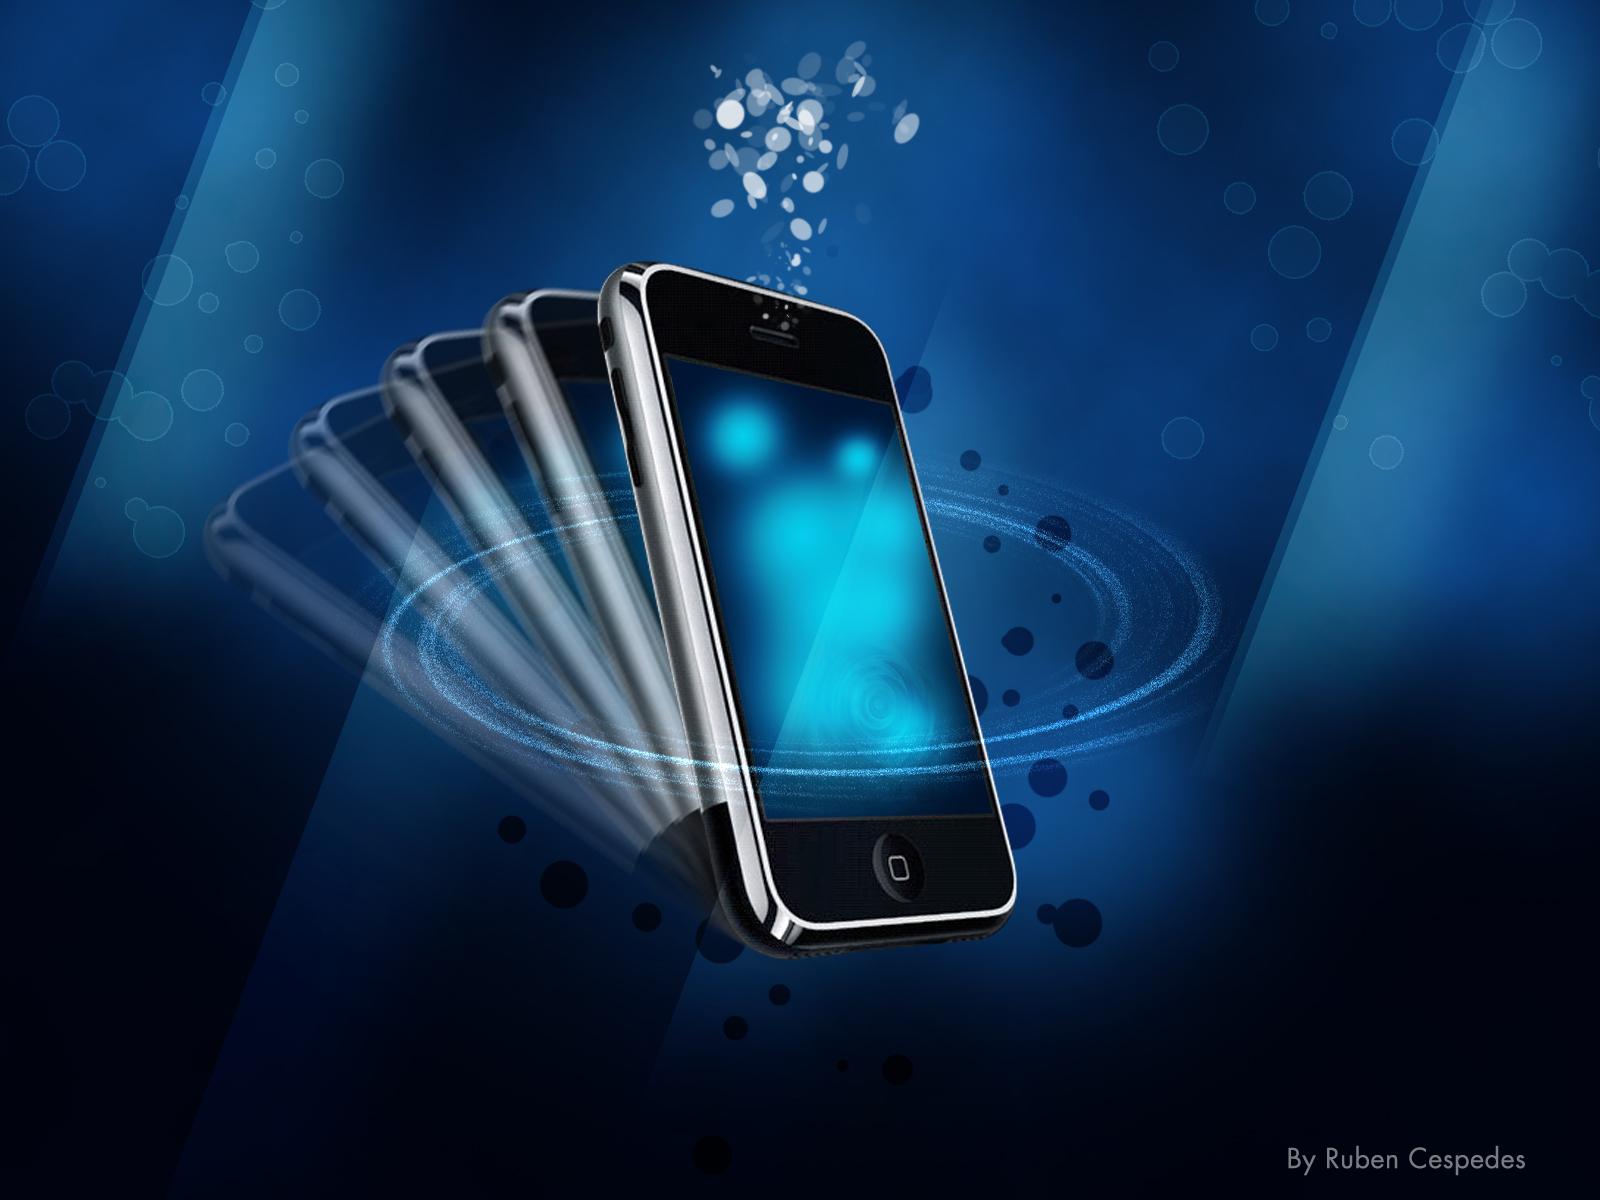 Iphone Wallpaper Hd